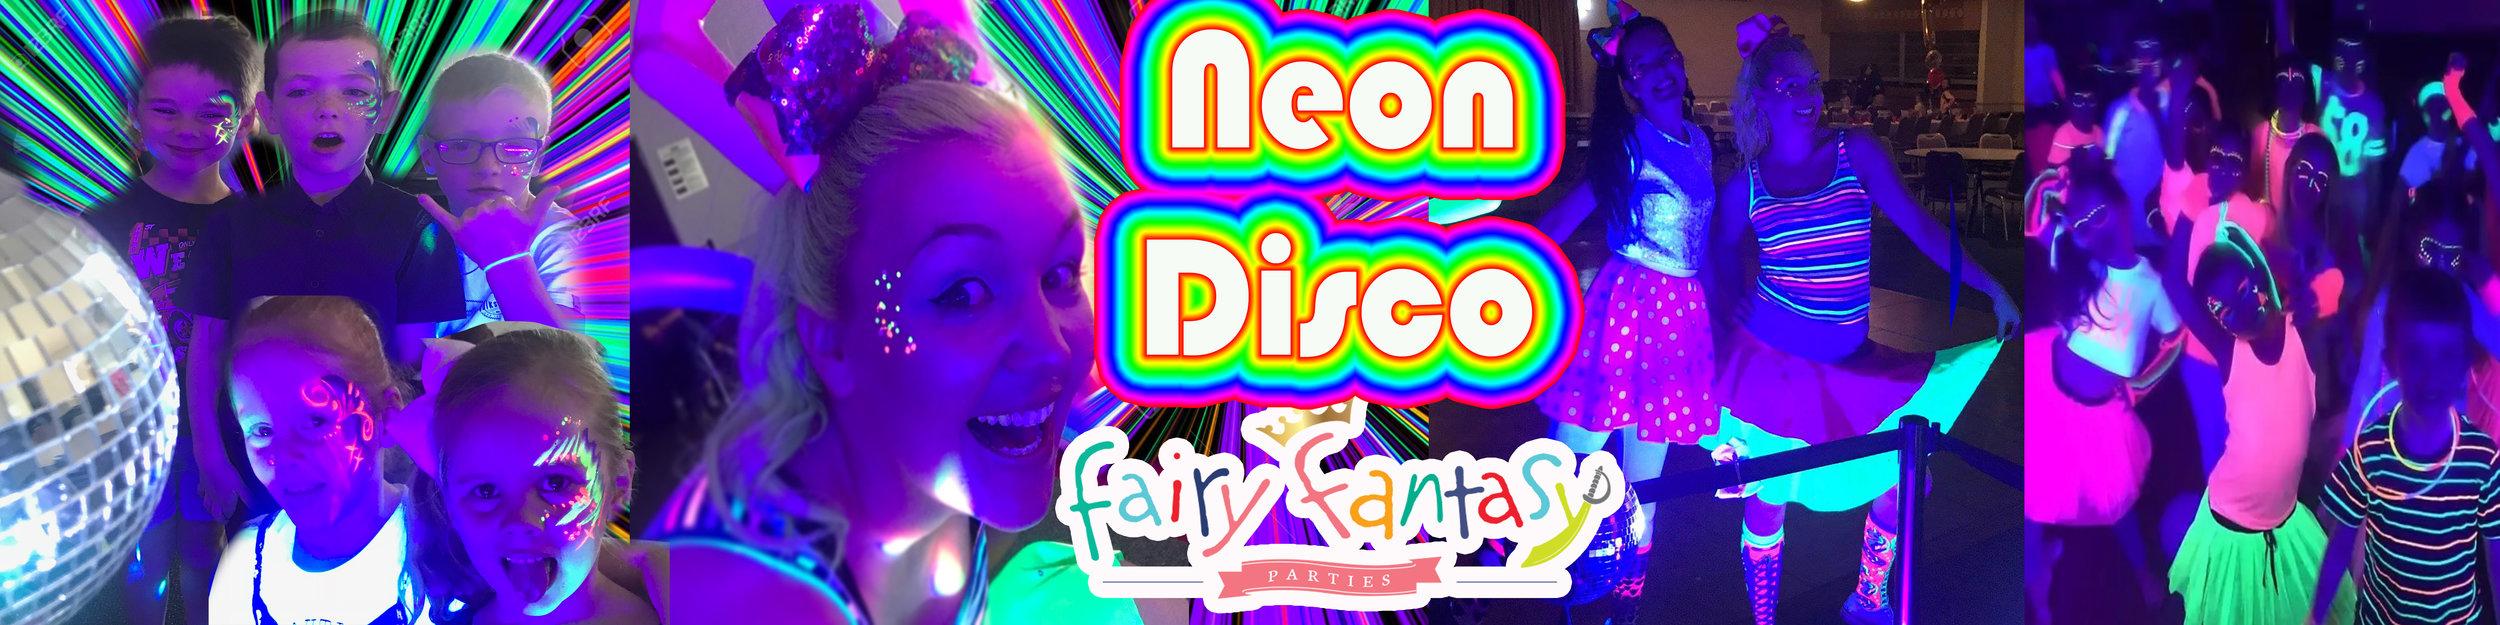 Neon Disco .jpg